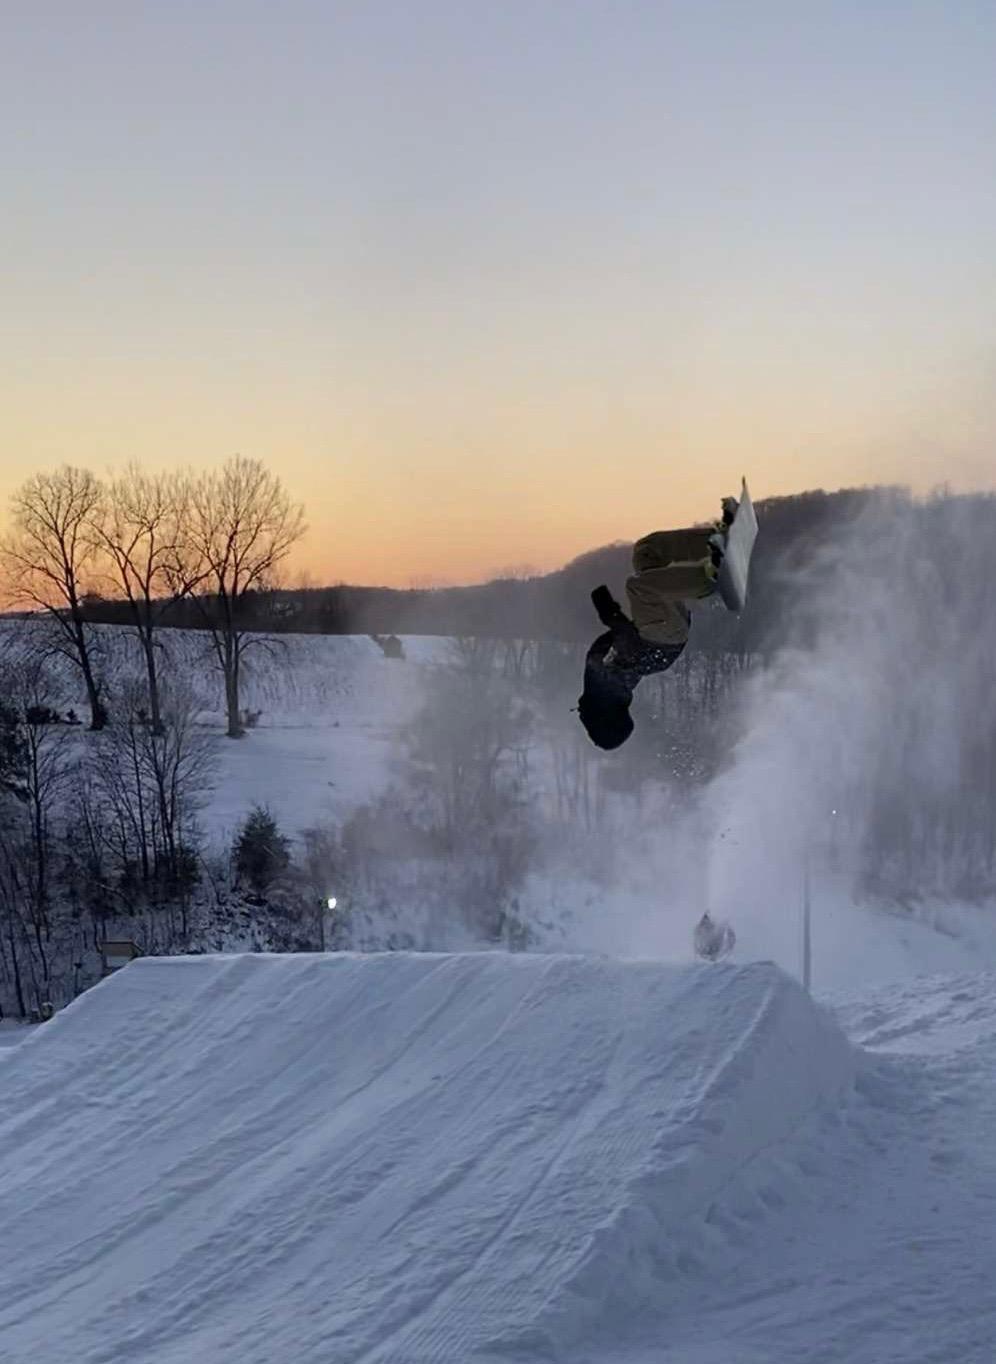 Adam Wagner, '21, at Sundown Mountain doing a backflip.